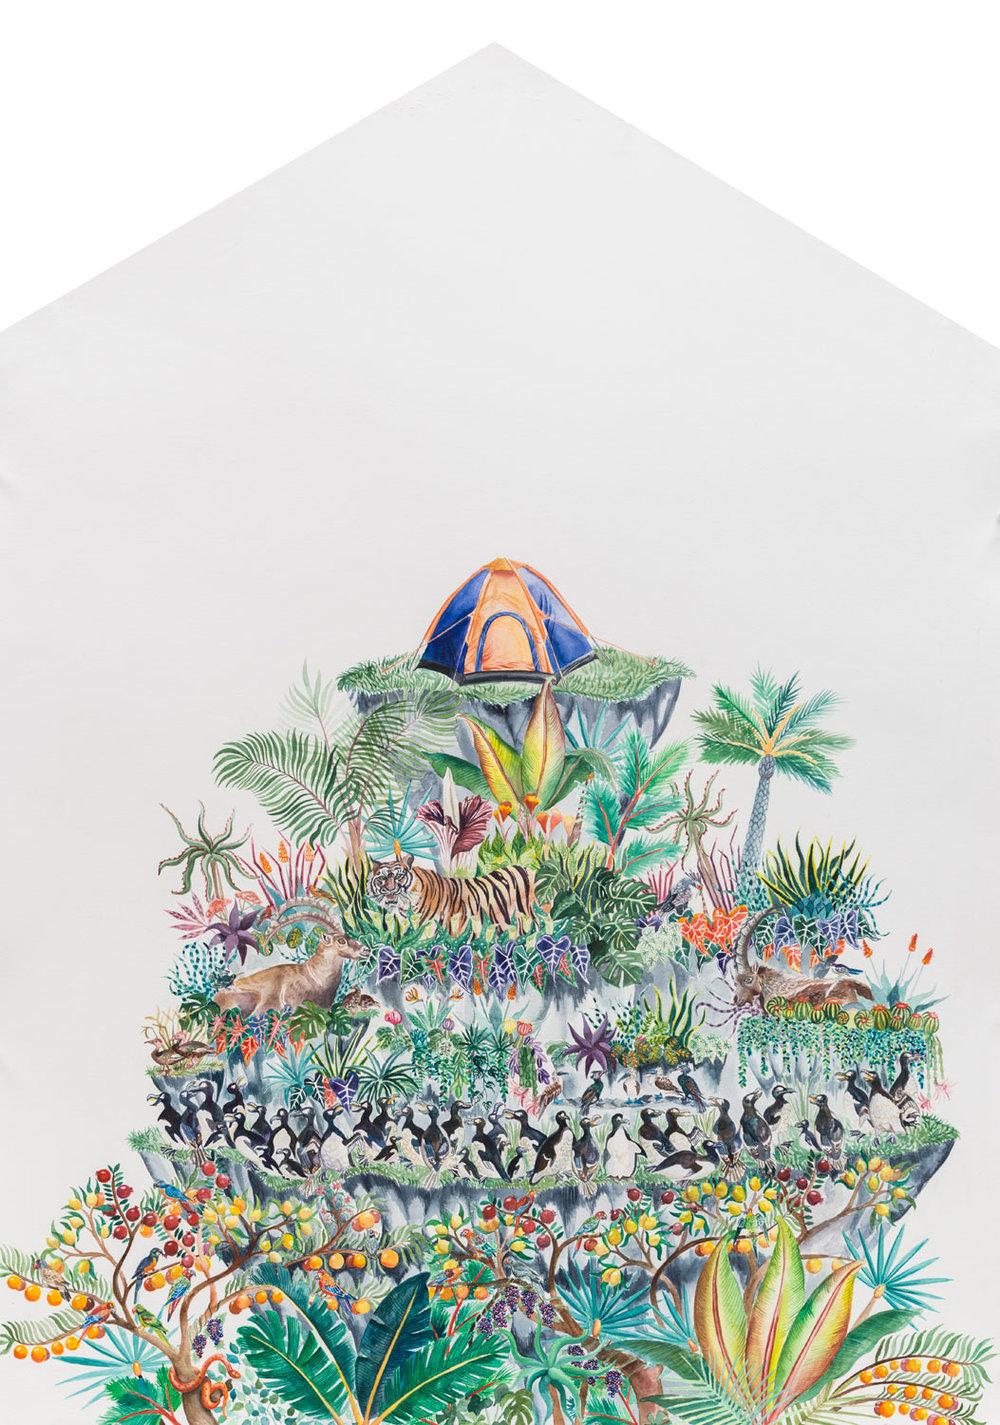 Robin-Crofut-Brittingham-Take-Shelter-Watercolour-on-paper-2018-37-in-x-27-in.jpg